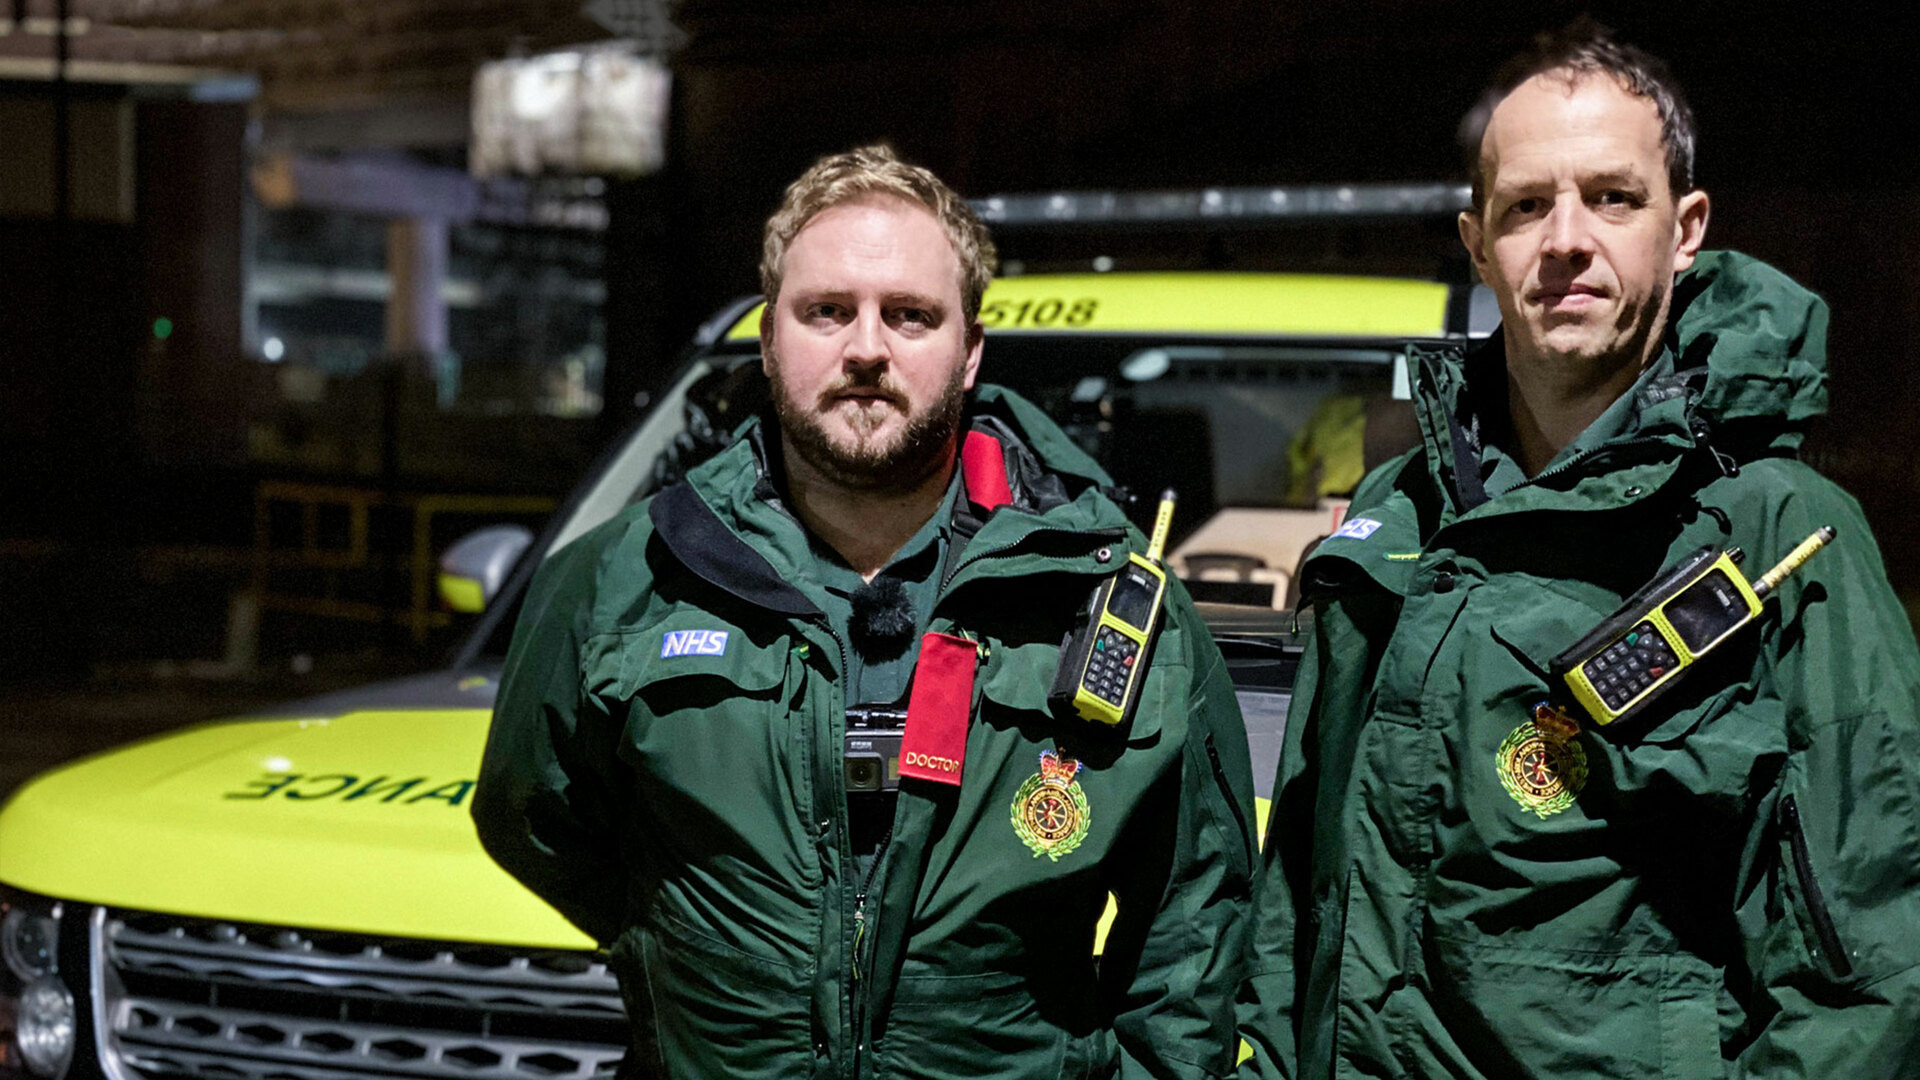 Show Ambulance: Code Red